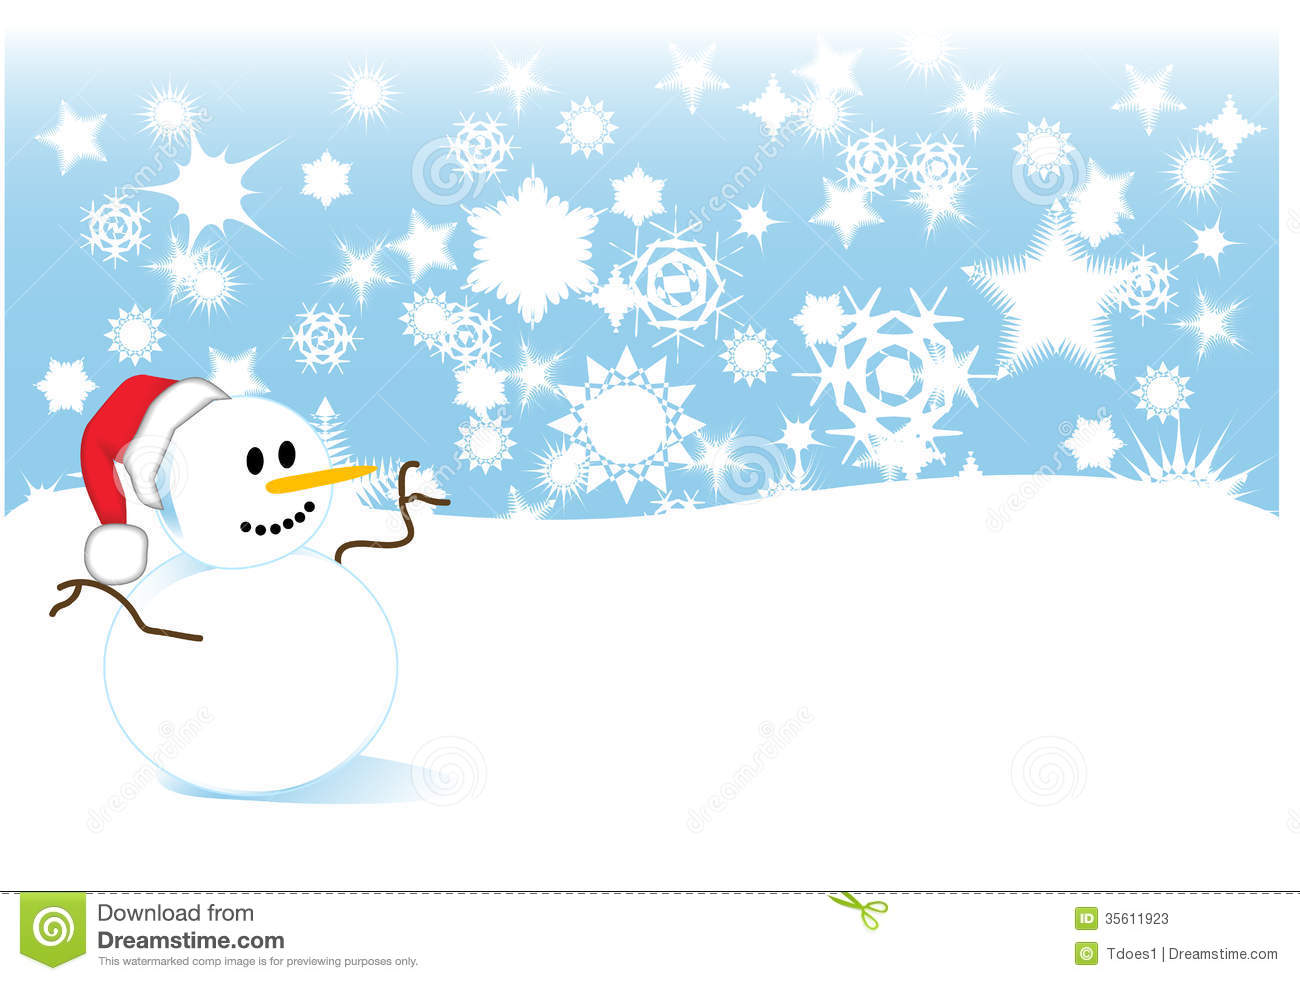 Snow Storm Clip Art Snowman In Snowstorm-Snow Storm Clip Art Snowman In Snowstorm-2